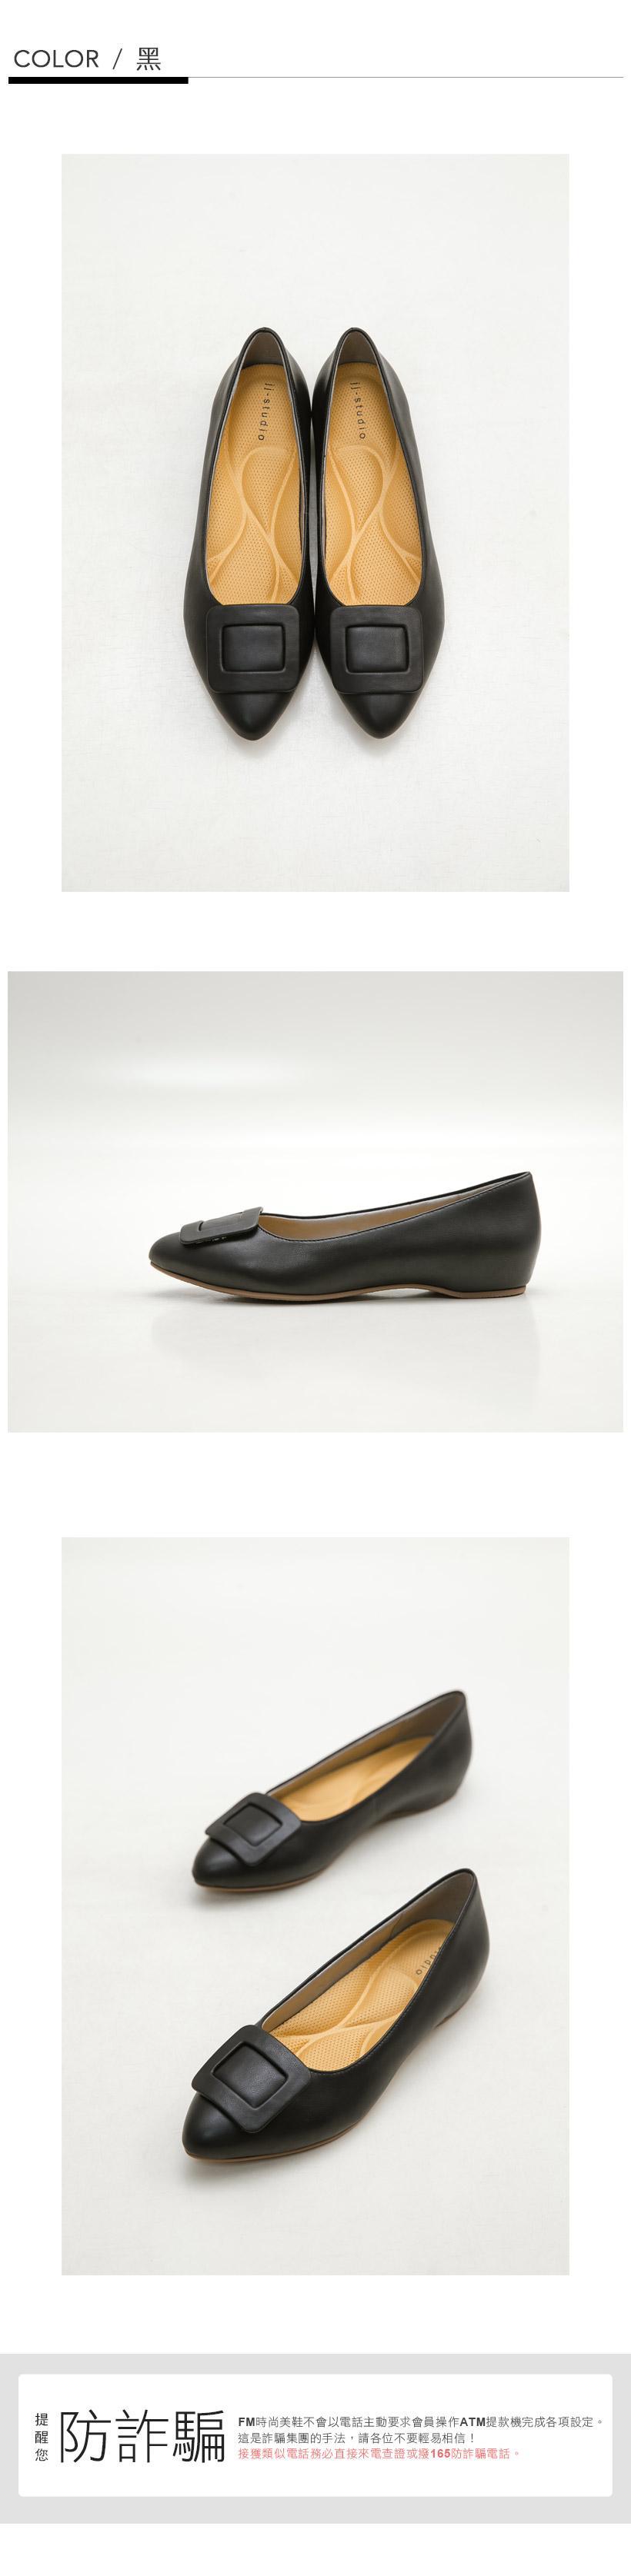 JJ-方釦防潑水內增高沙發鞋(黑)-大尺碼